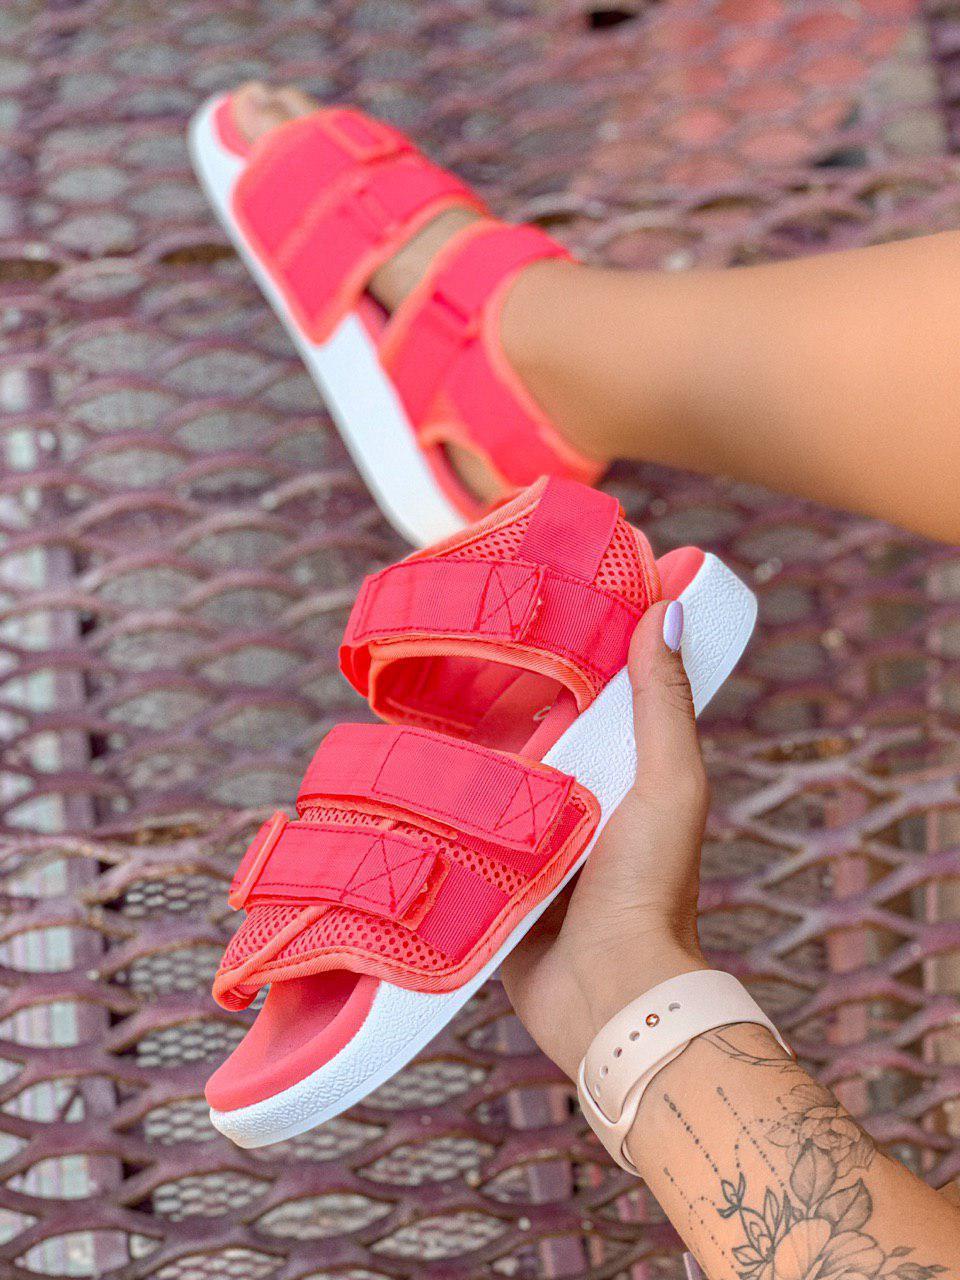 Женские Сандалии Adidas Adilette коралловые (реплика)